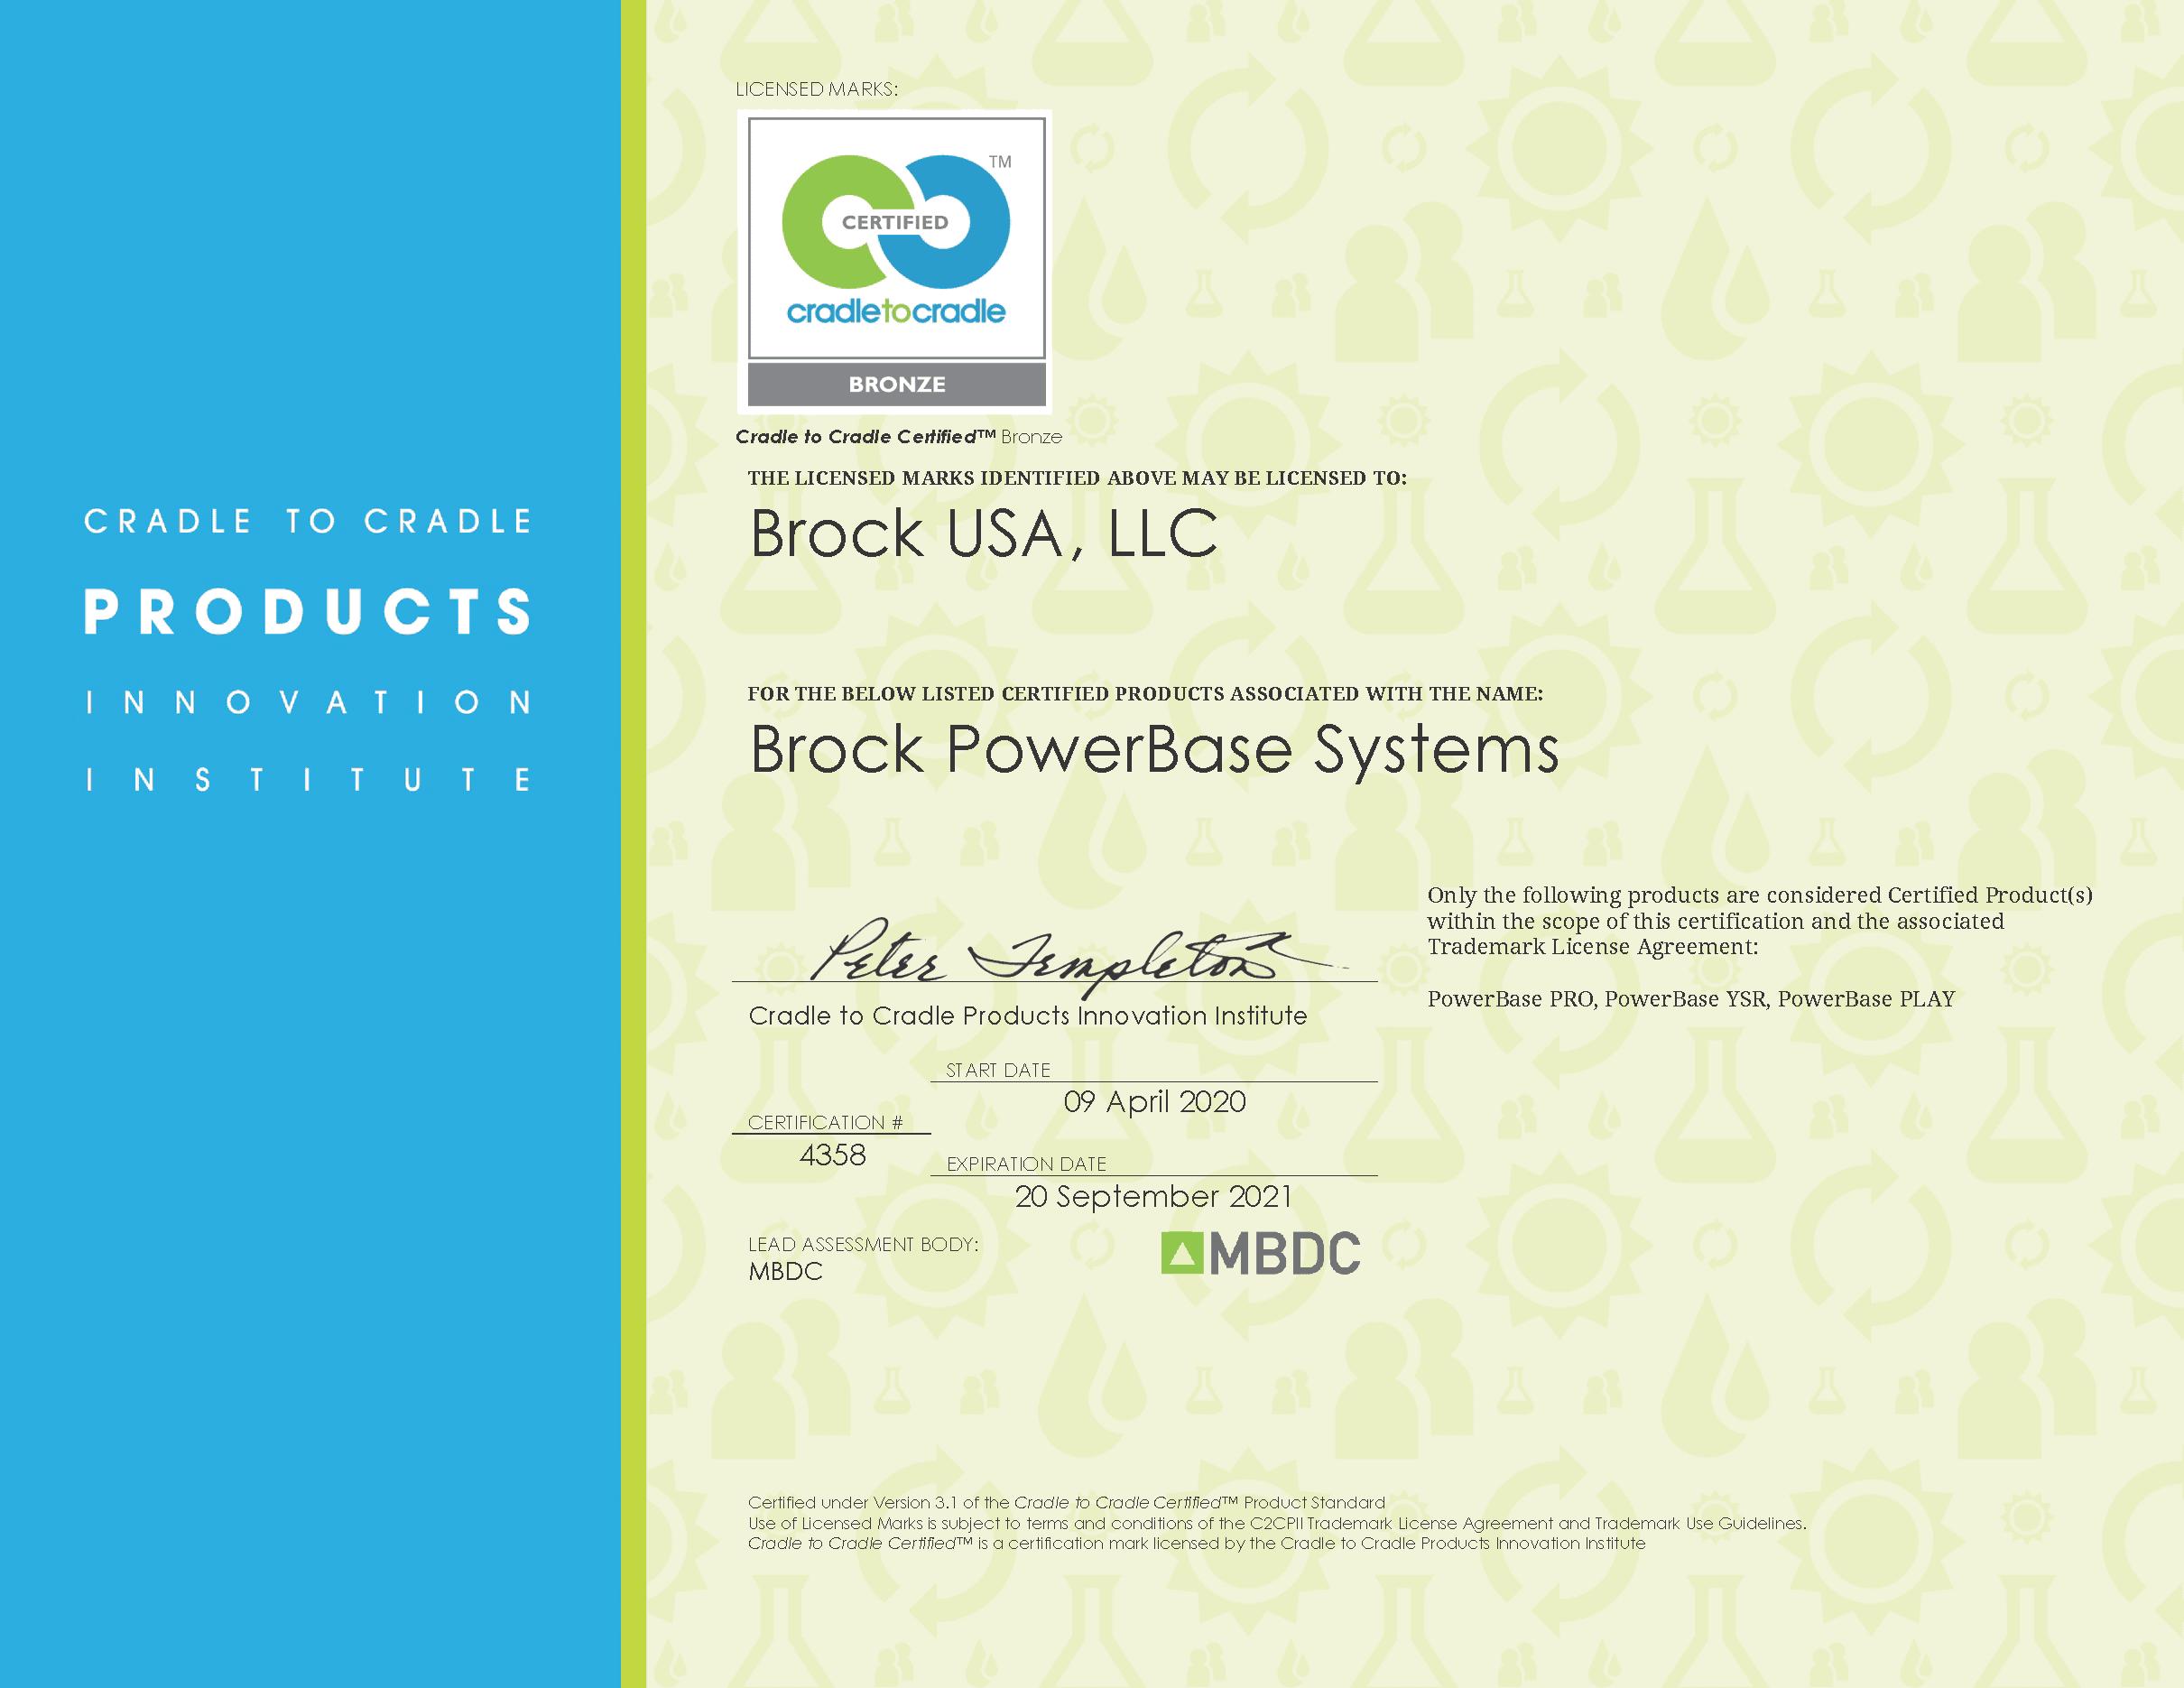 13. Brock PowerBase C2C Certificate 2020-2021